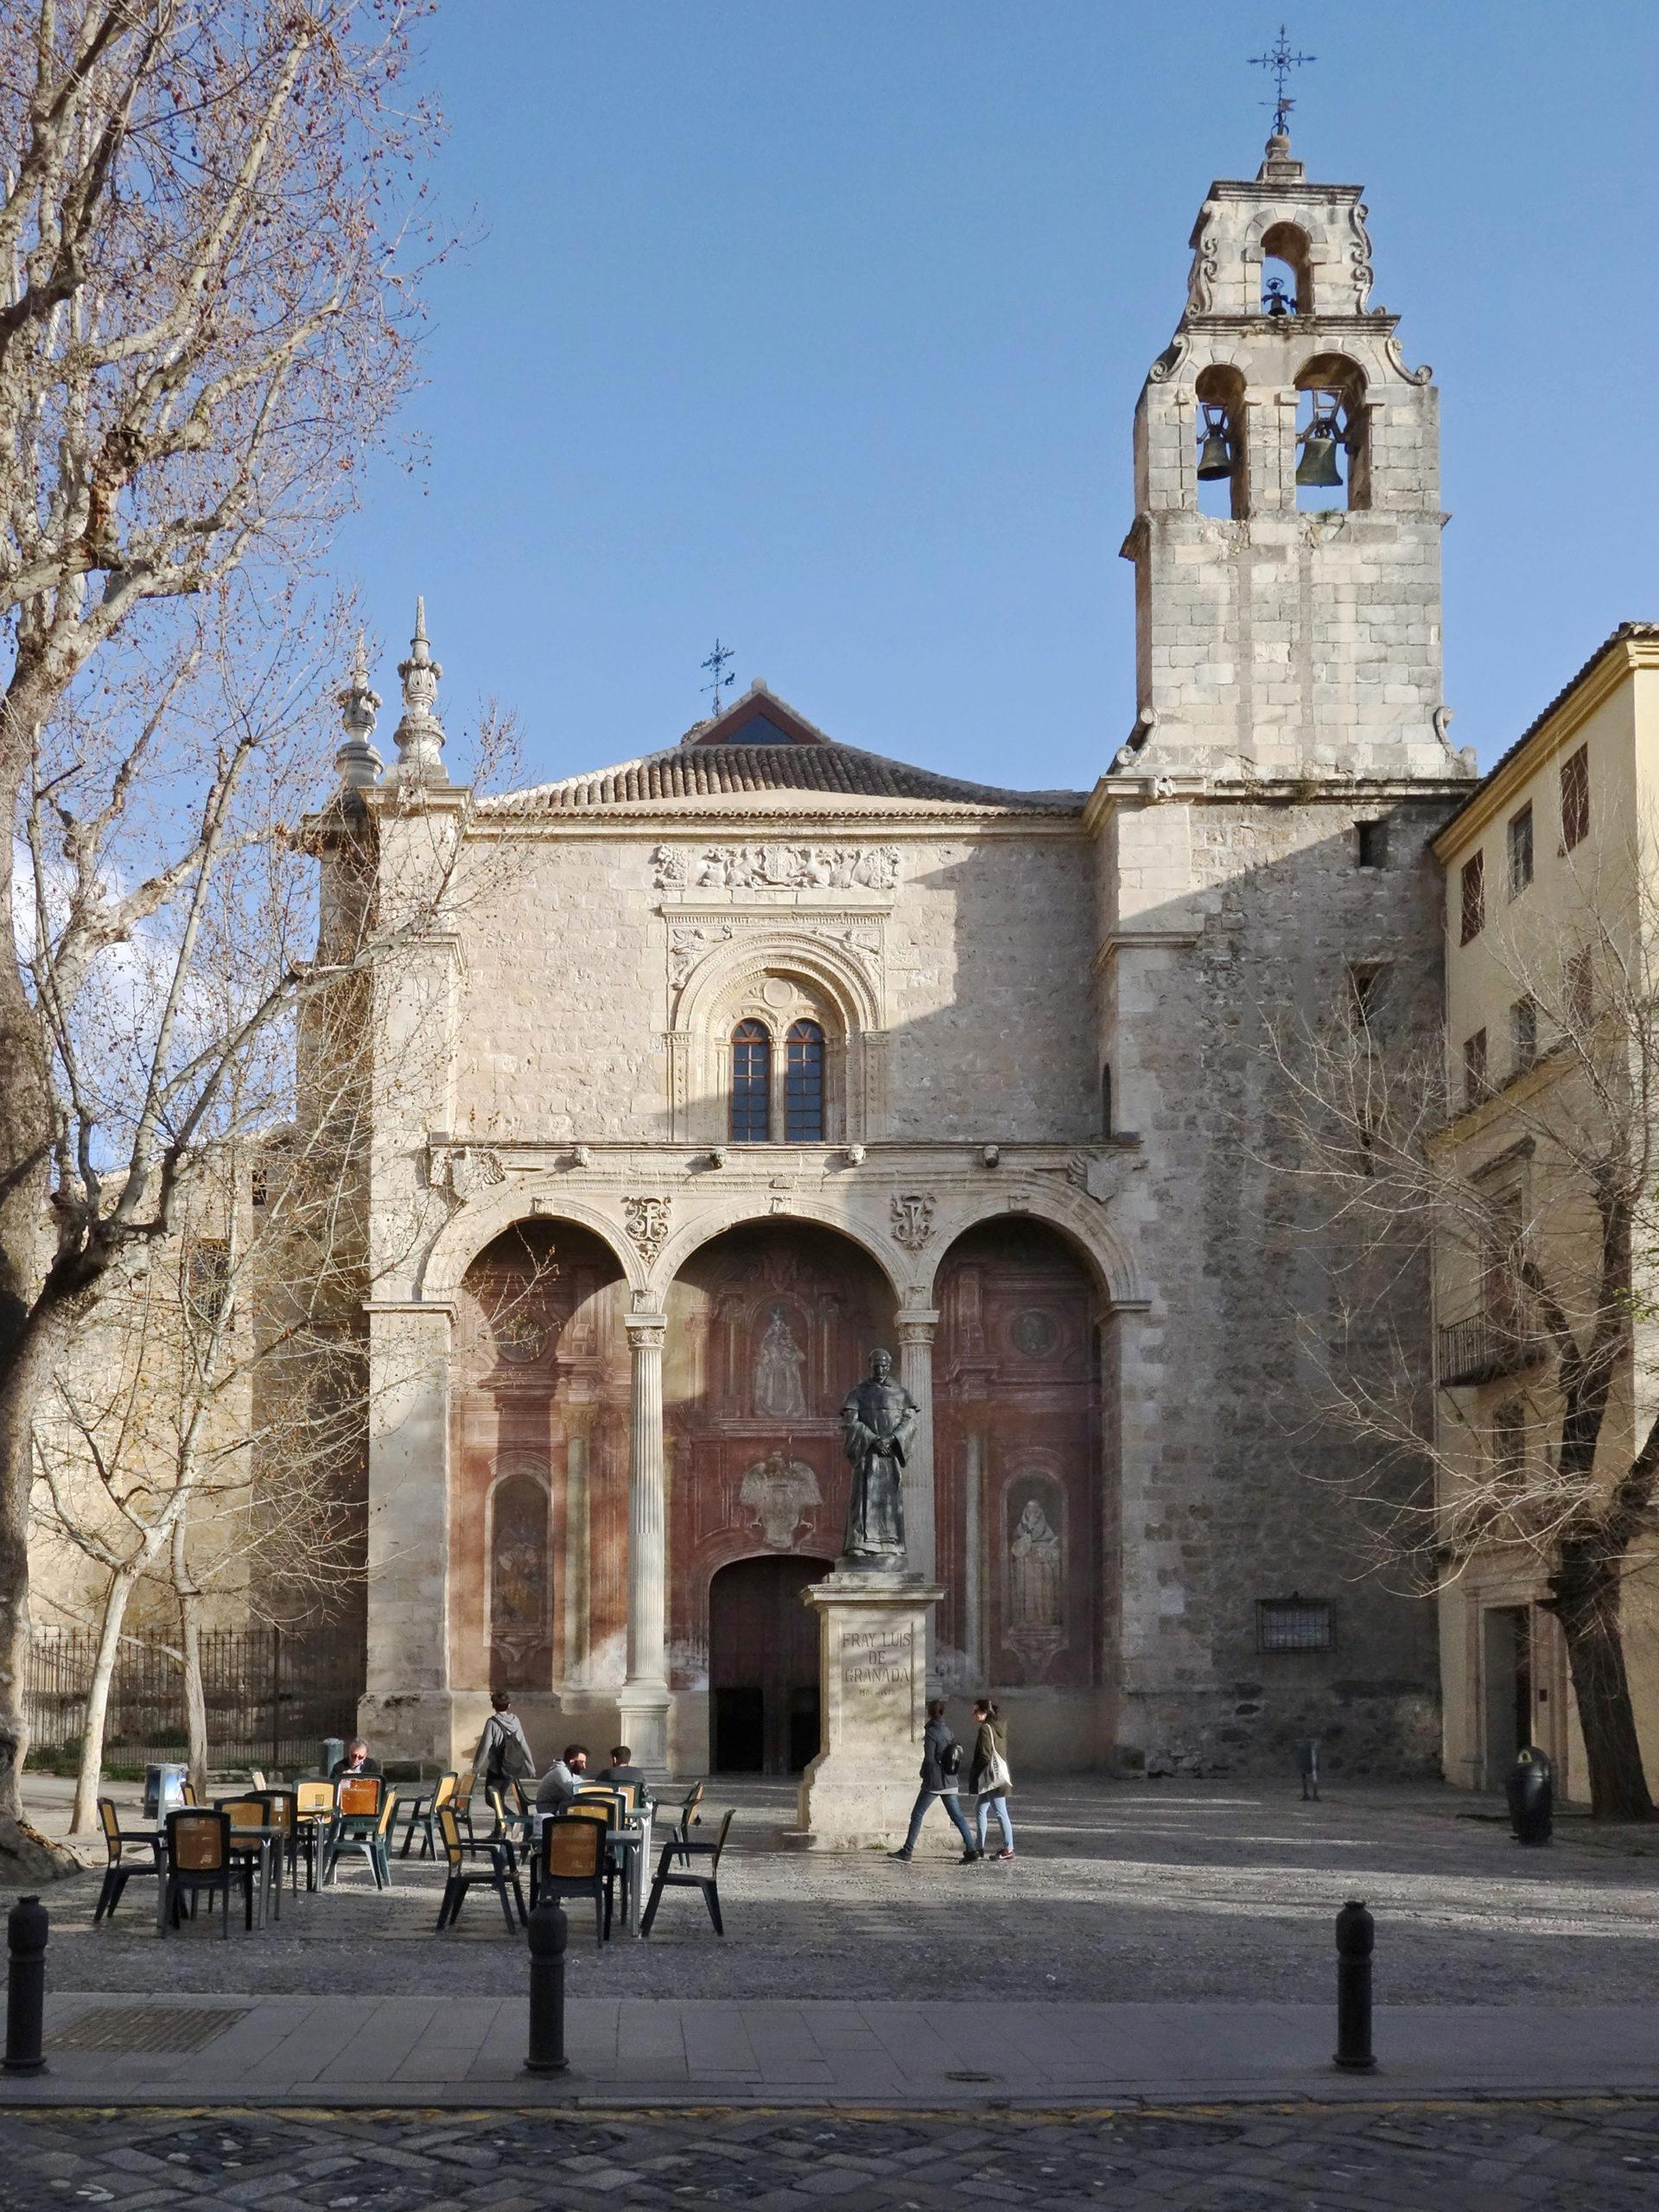 Iglesia de Sta. Cruz la Real (Sto. Domingo) - Parroquia de Sta. Escolástica